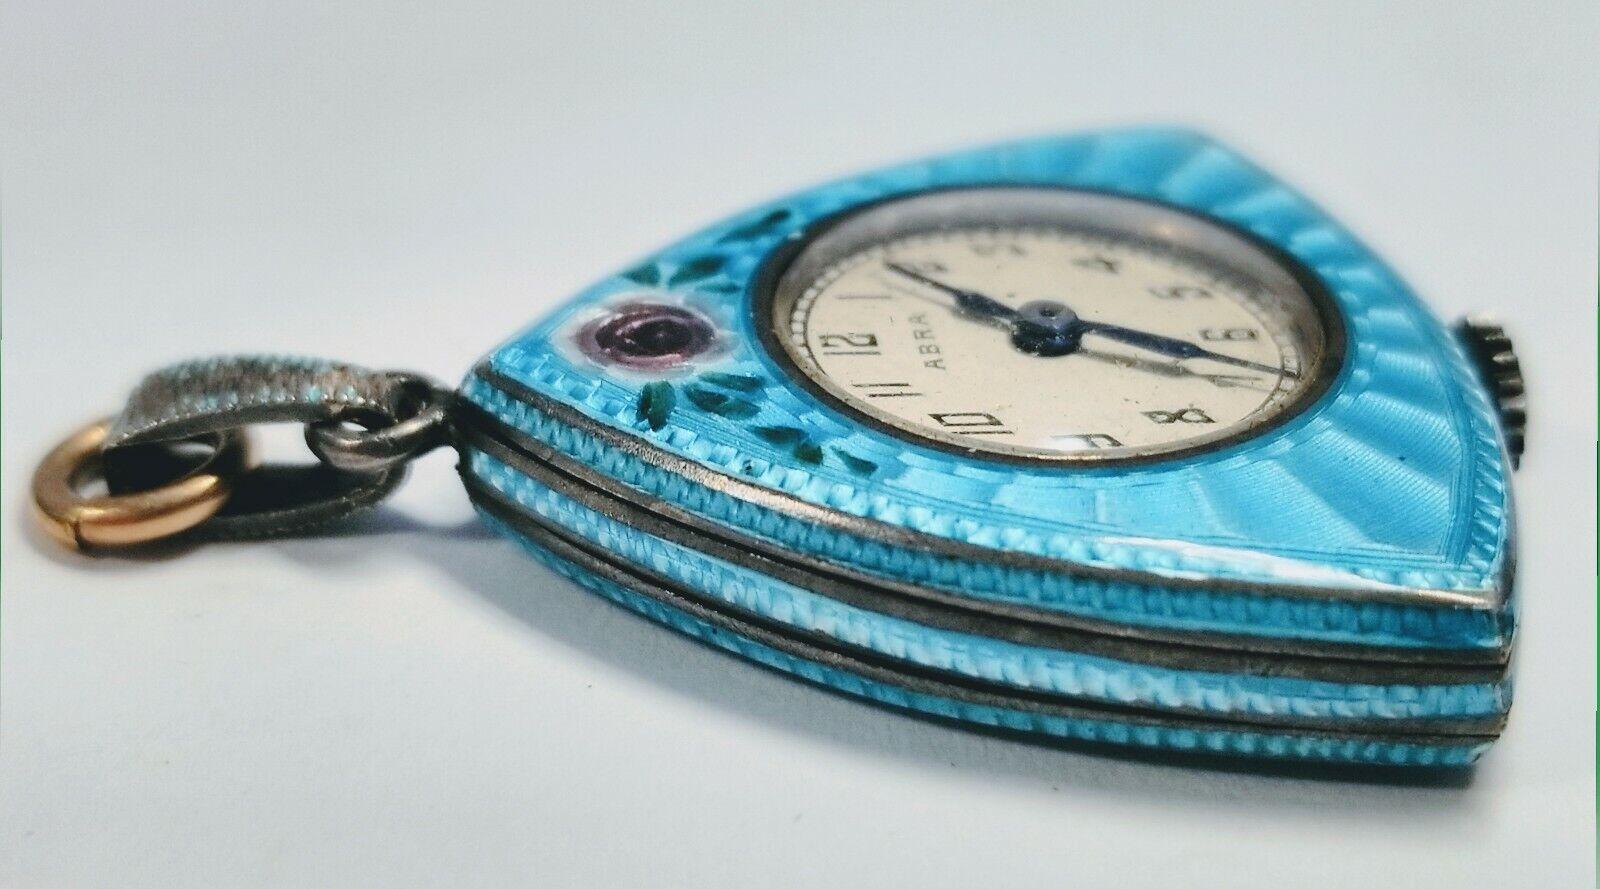 Vintage Abra Sterling Silver and Blue Enamel Triangular Pocket Watch Pendant